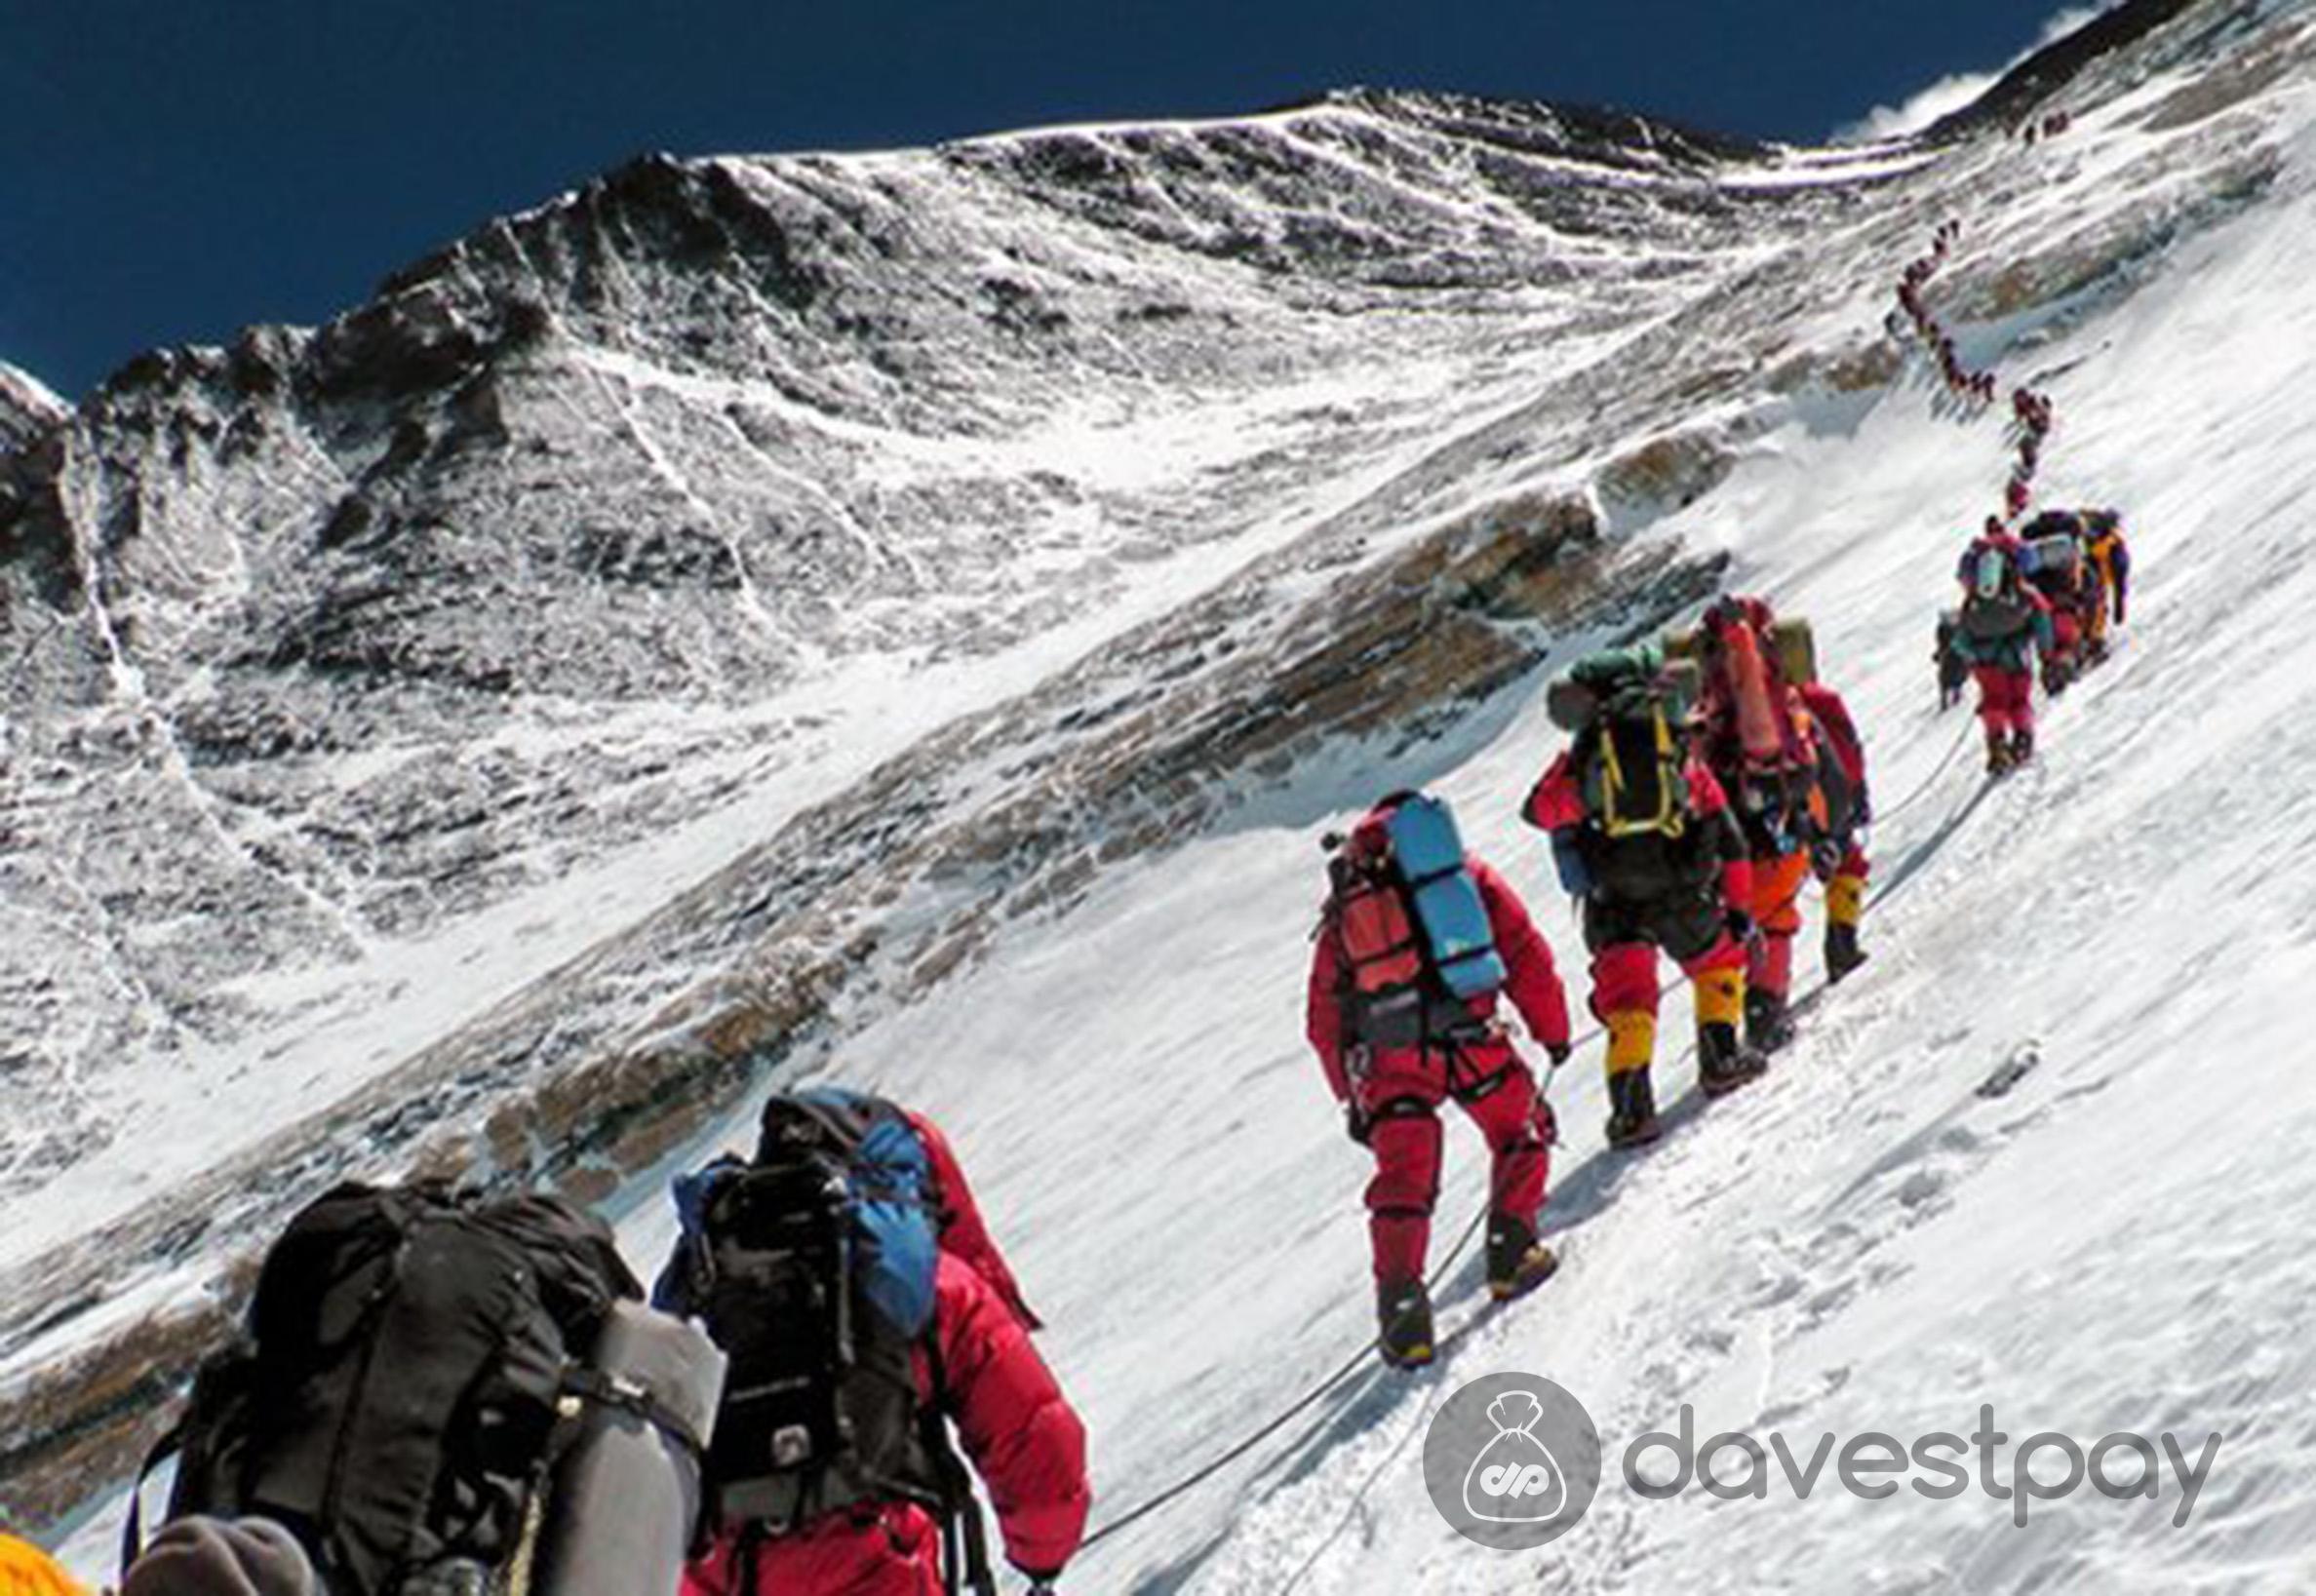 Ikuti Tips DavestPay Agar Terhindar Forstbite Ketika Mendaki